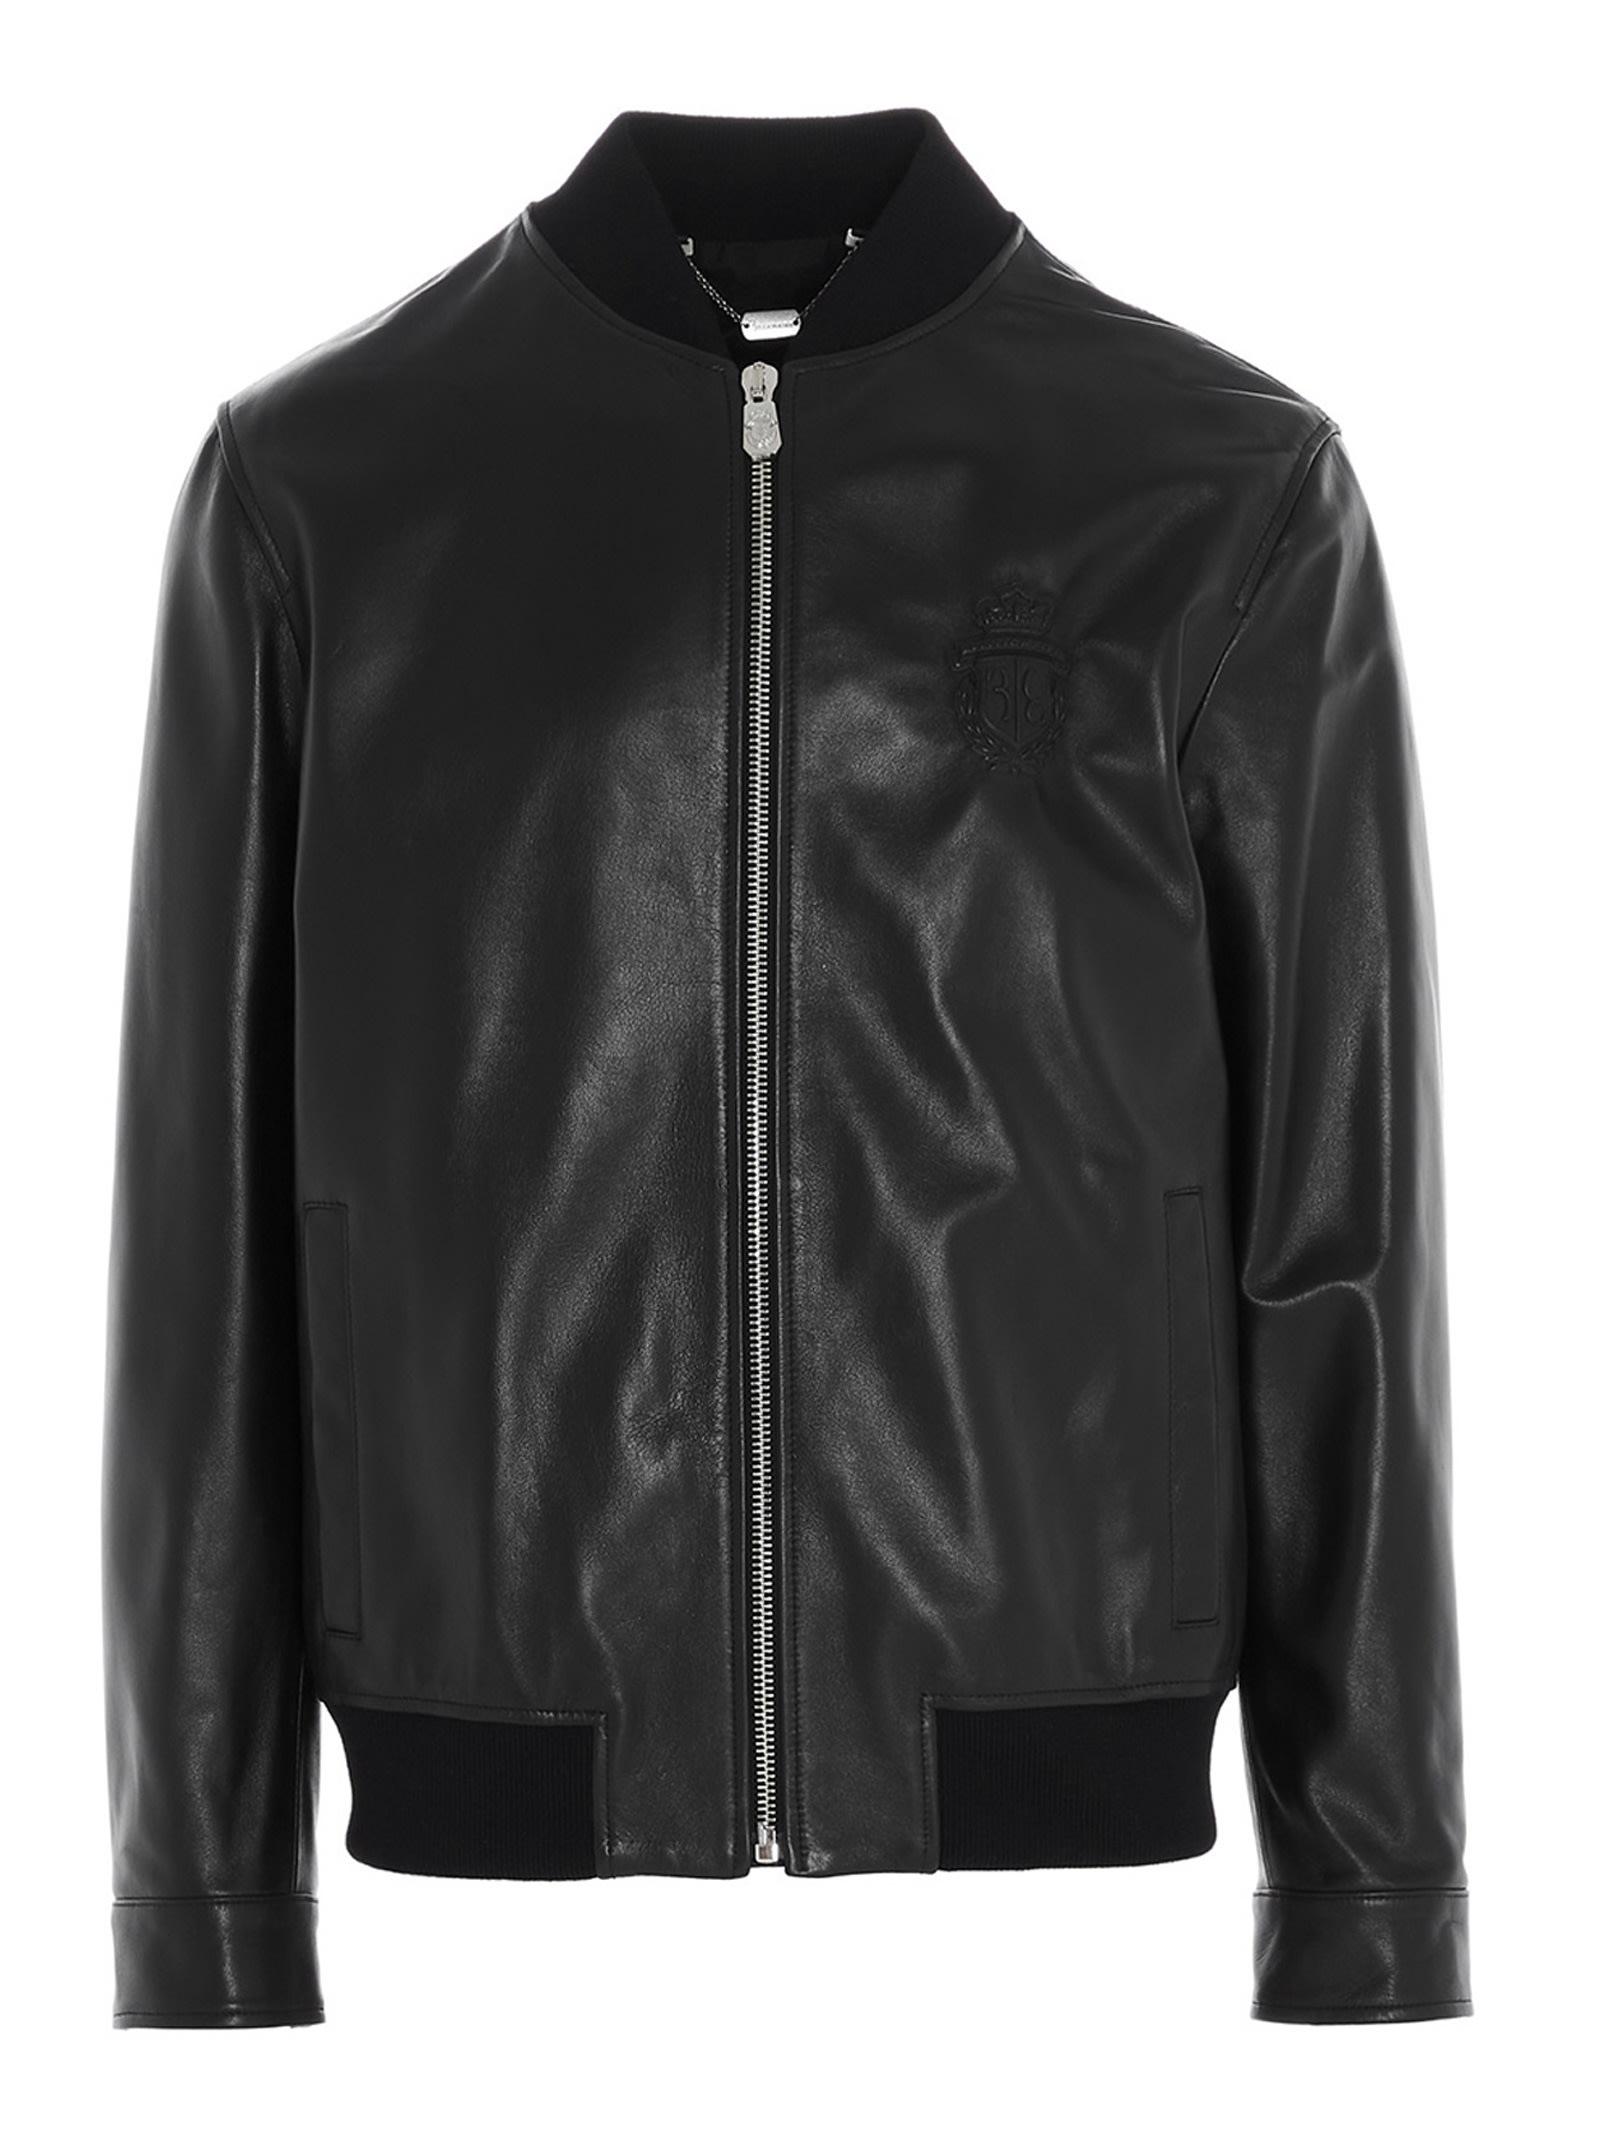 Billionaire crest Jacket